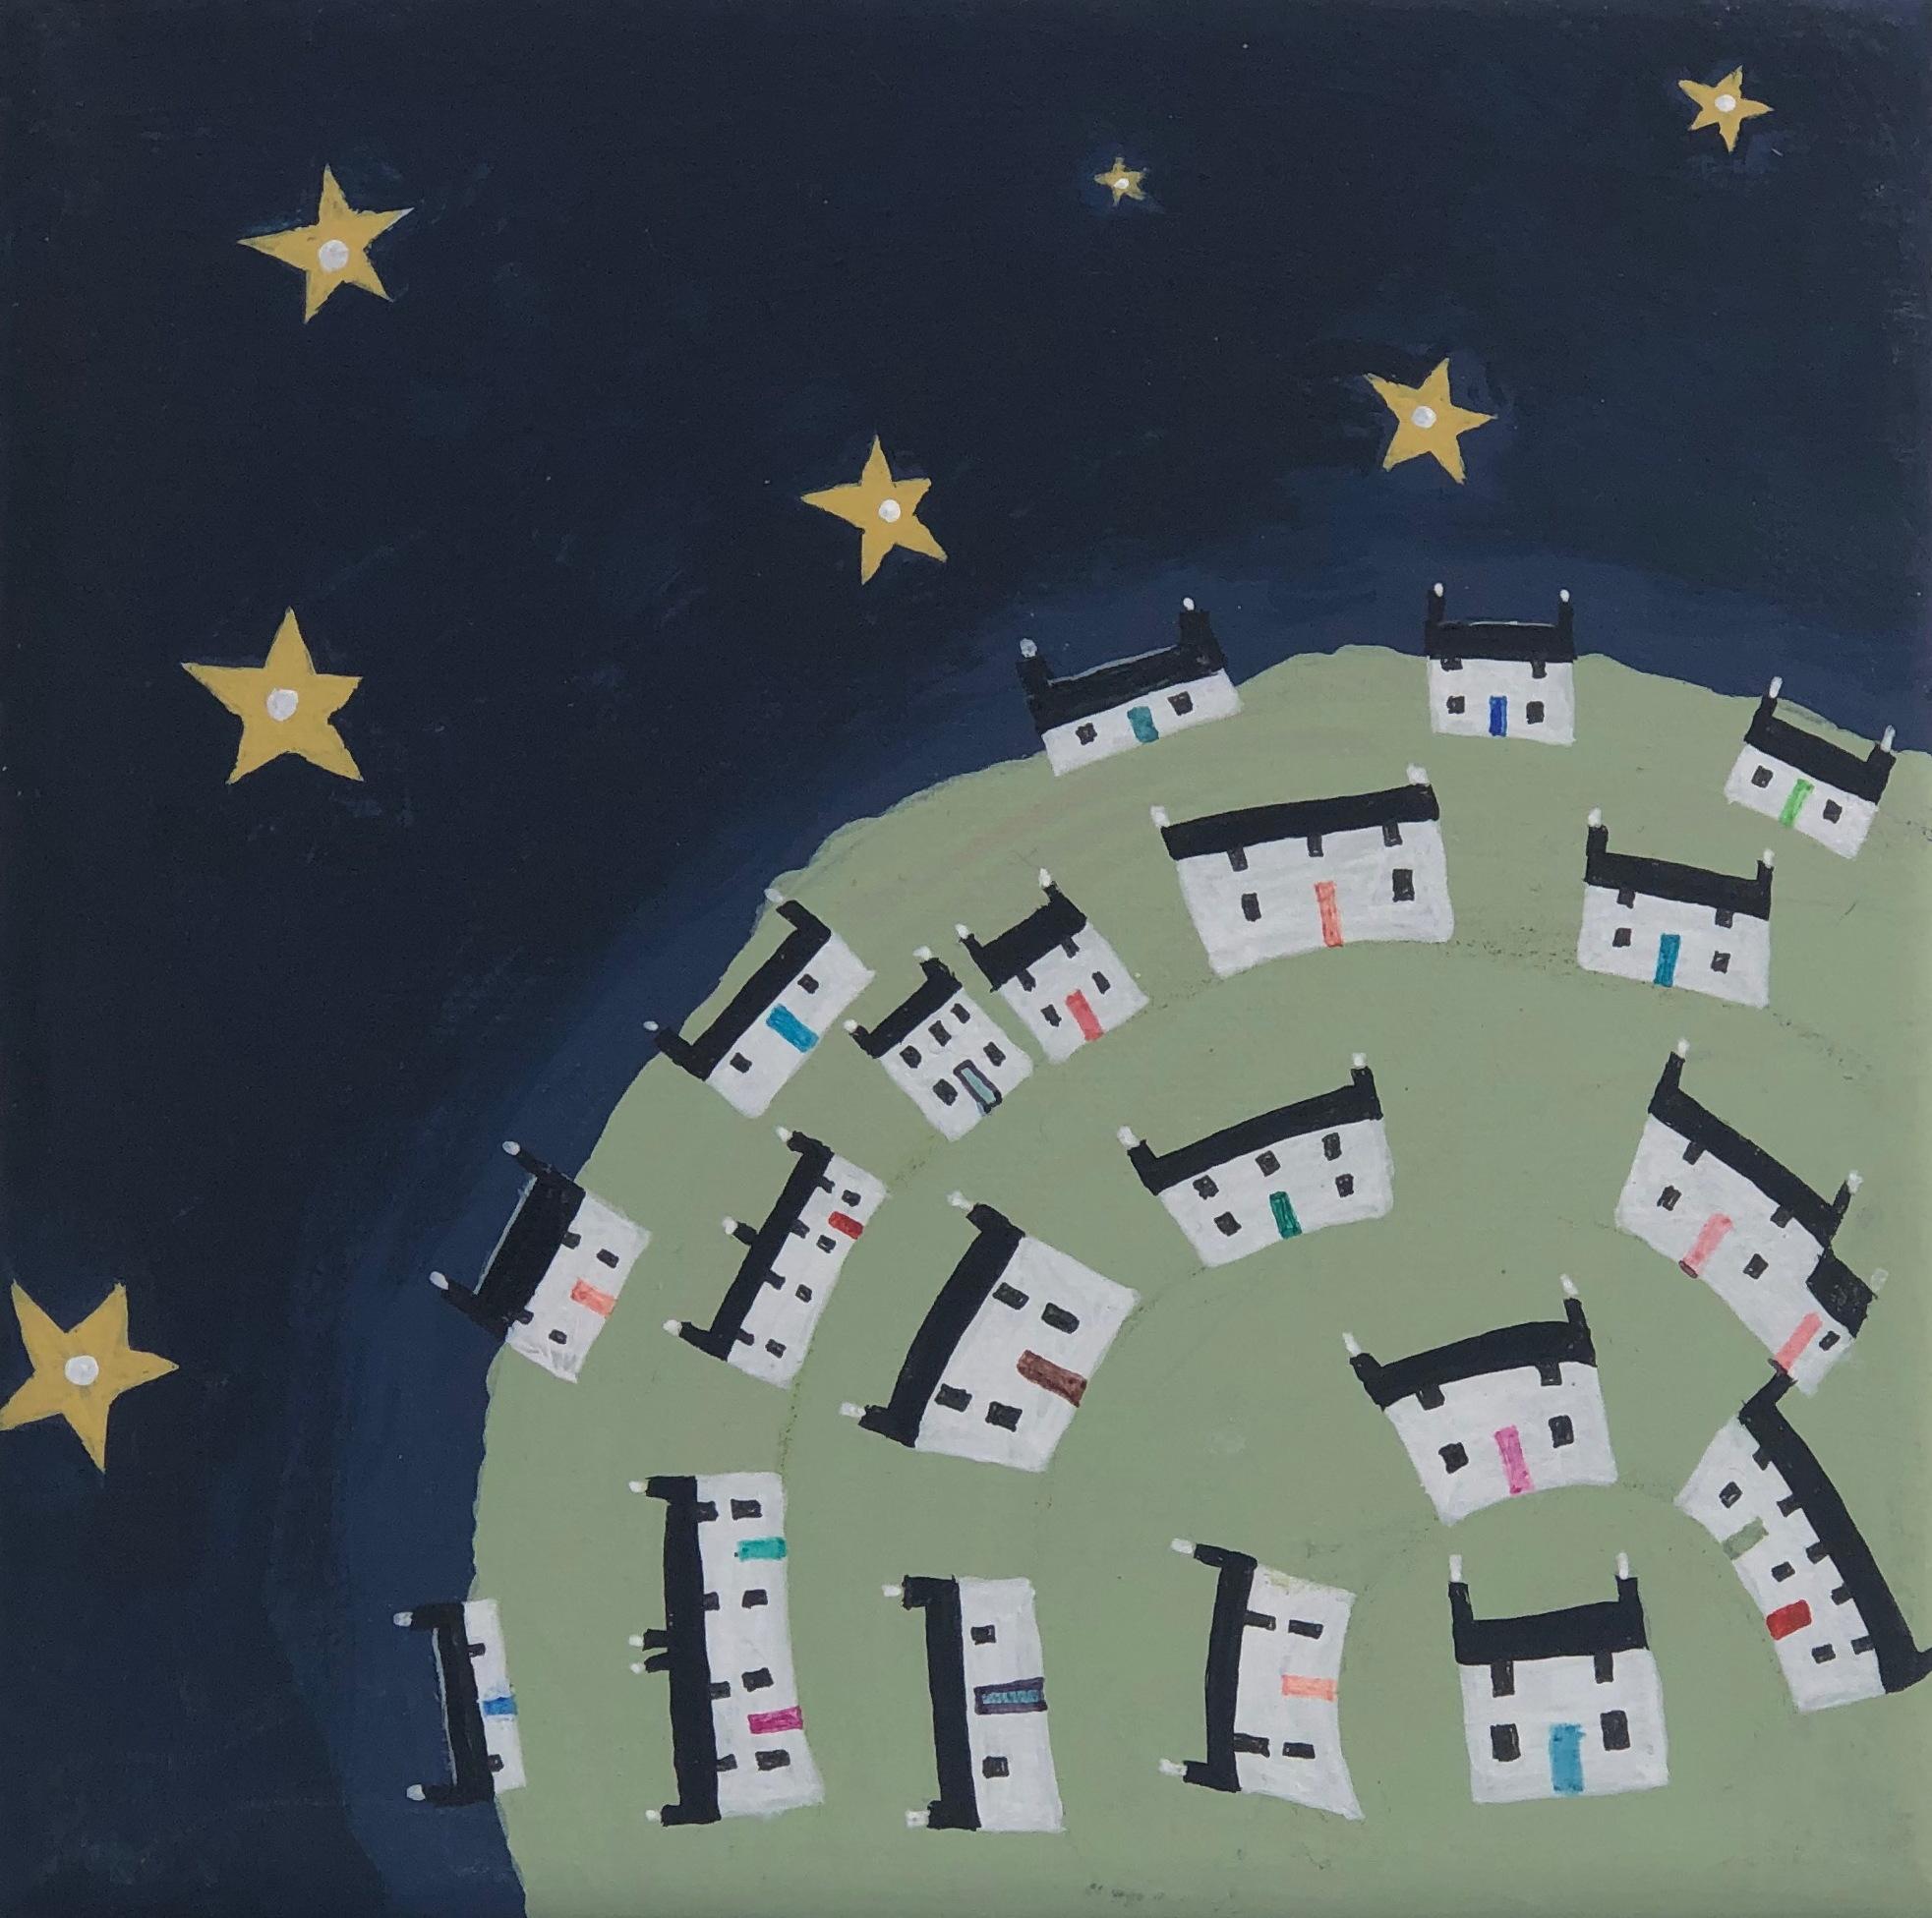 painting-stars:houses.jpg